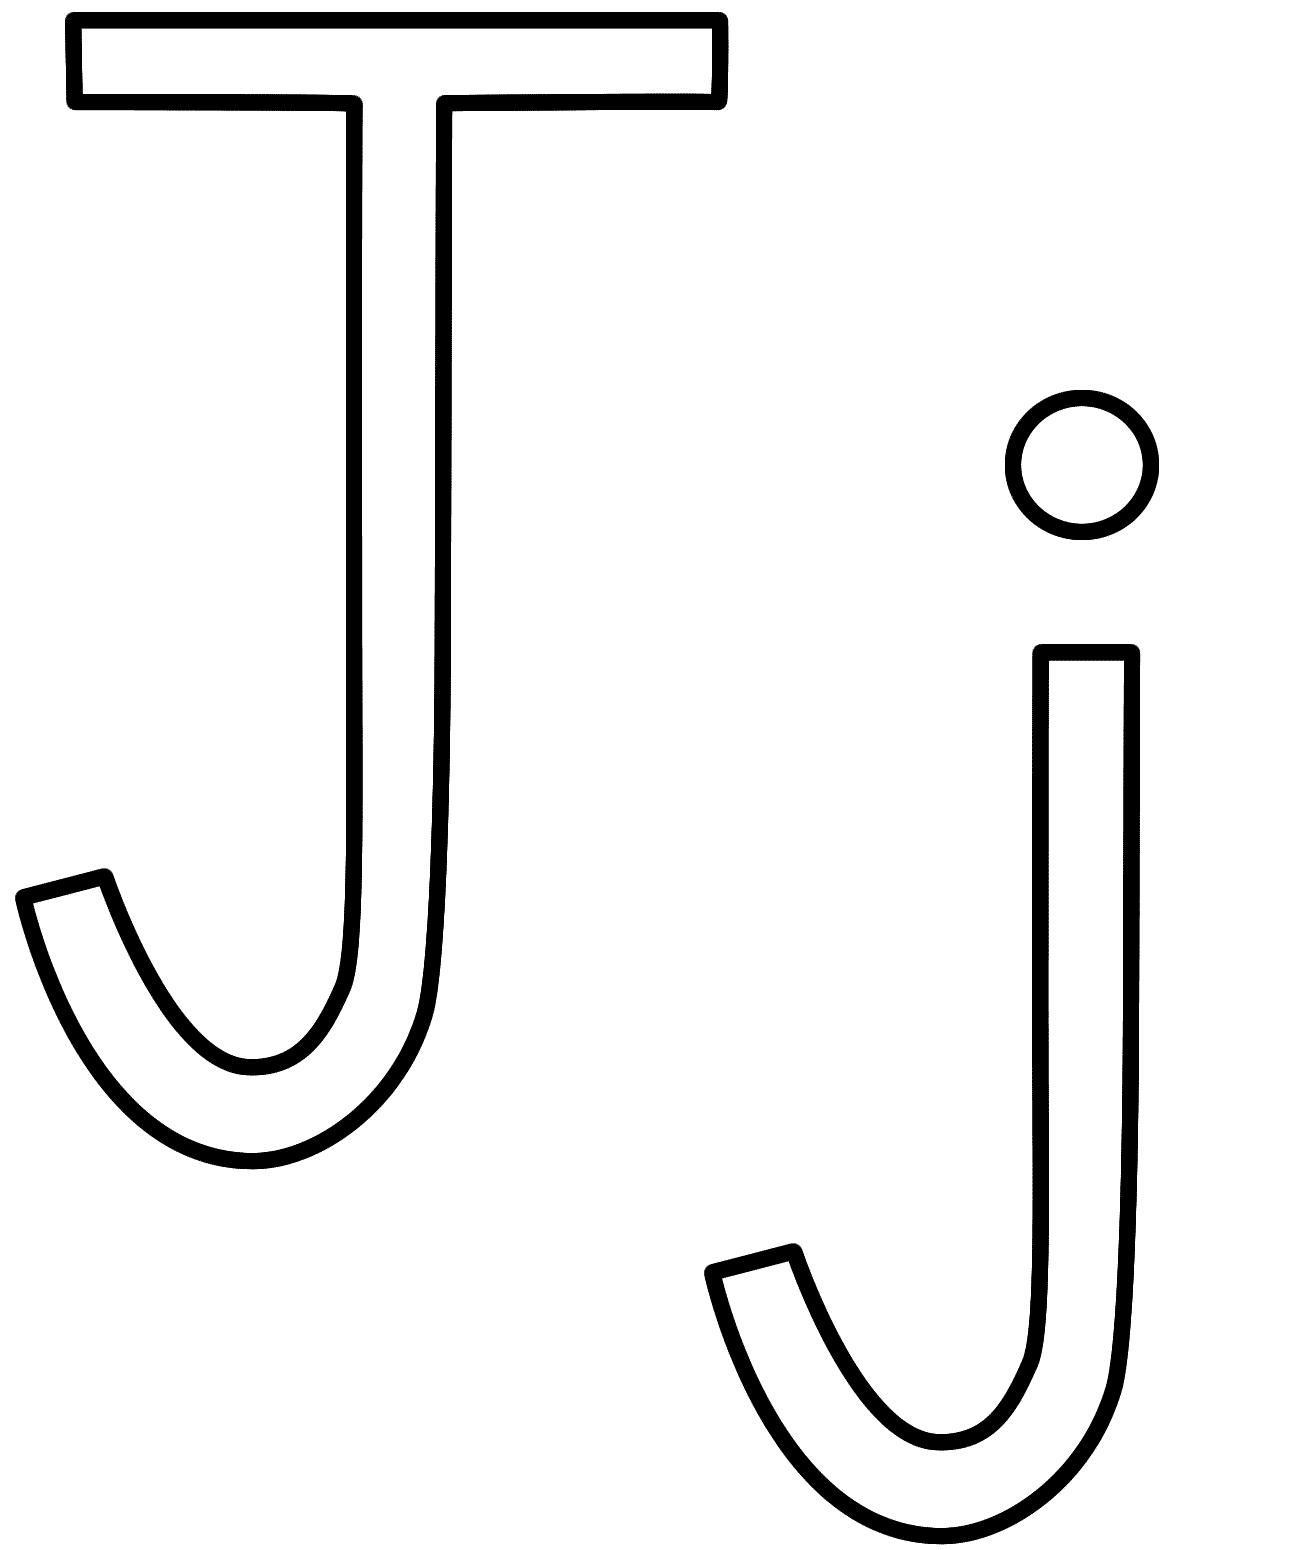 letter j coloring sheet letter j coloring page twisty noodle sheet j letter coloring